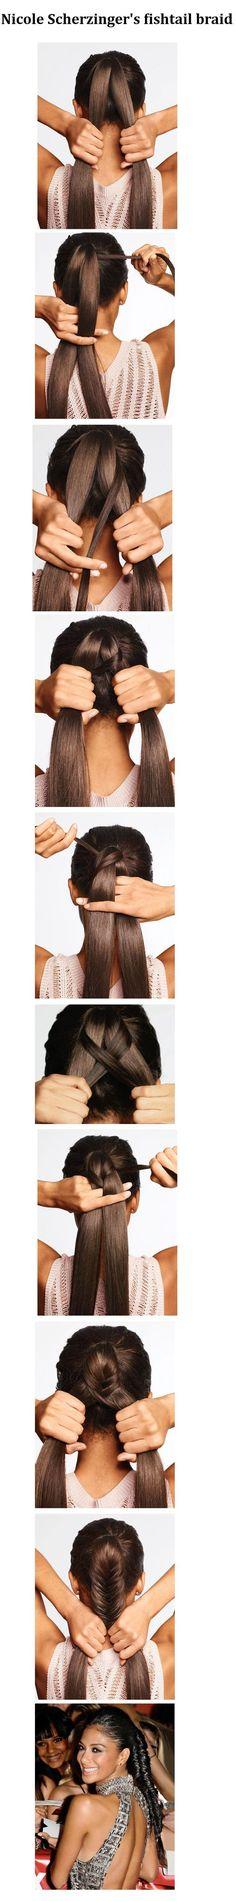 Nicole Scherzinger's Fishtail Braid---DIY Fishtail Braid